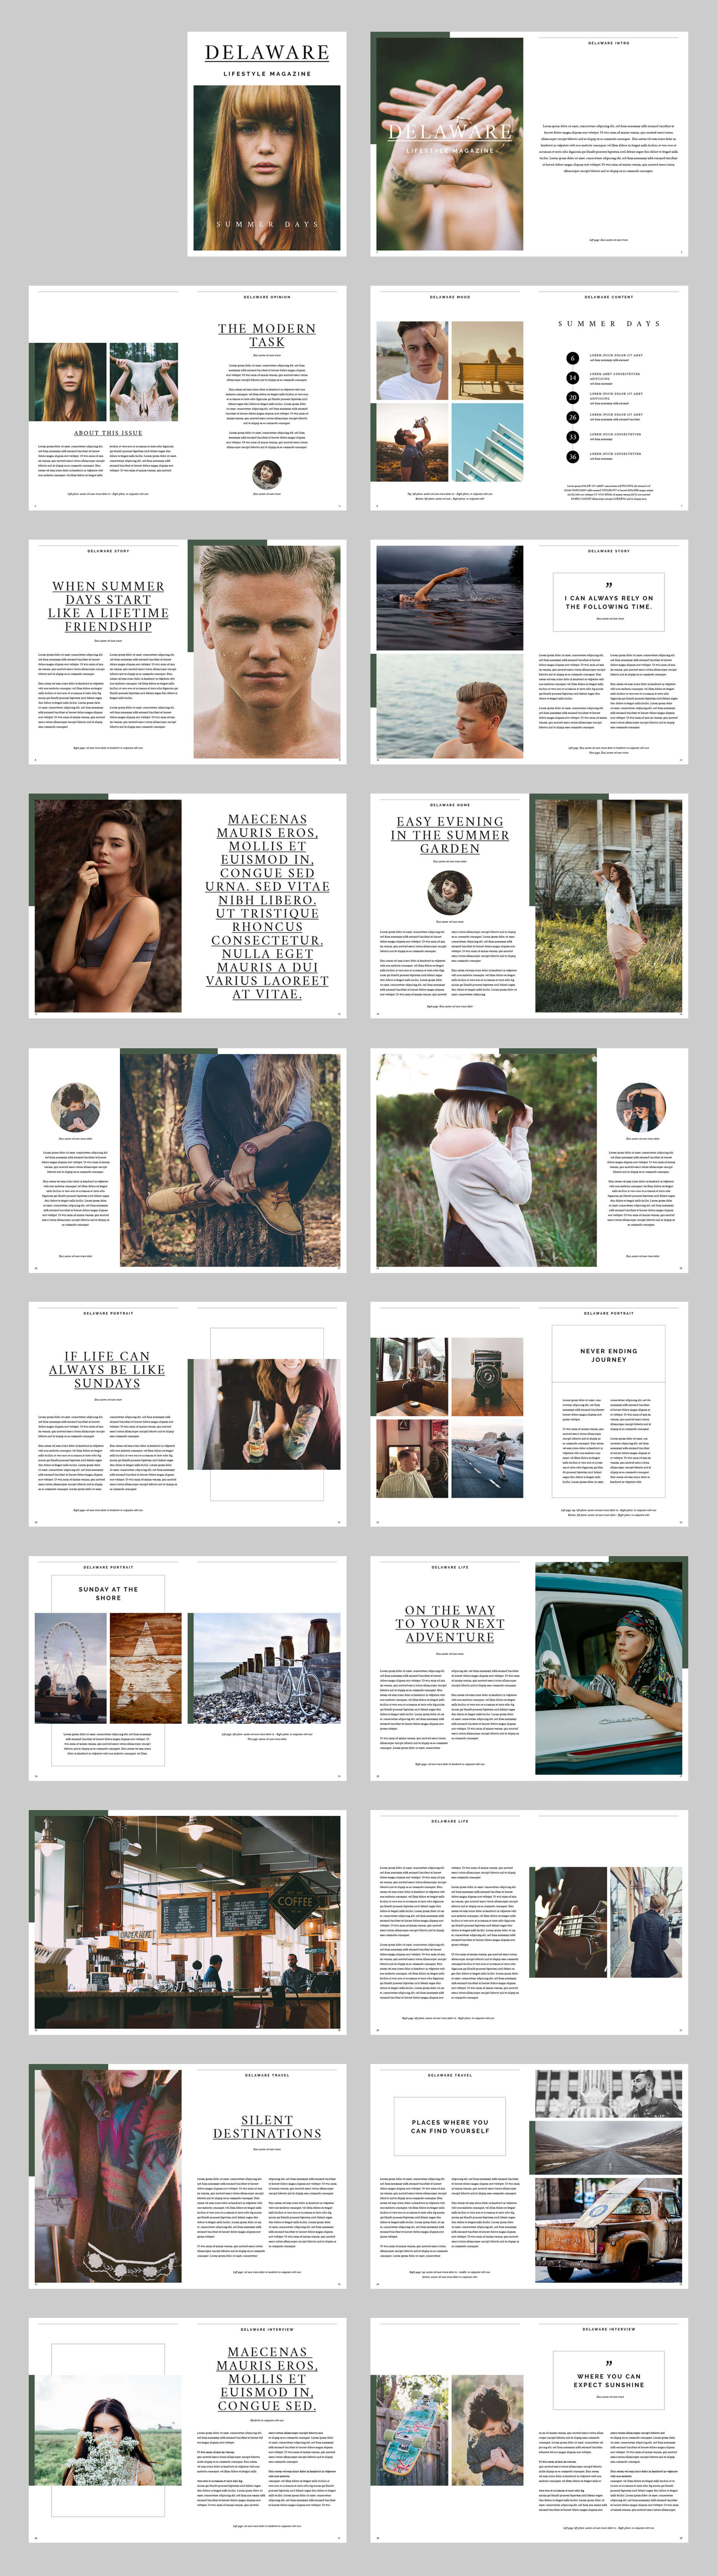 Delaware Lifestyle Magazine alle Seiten